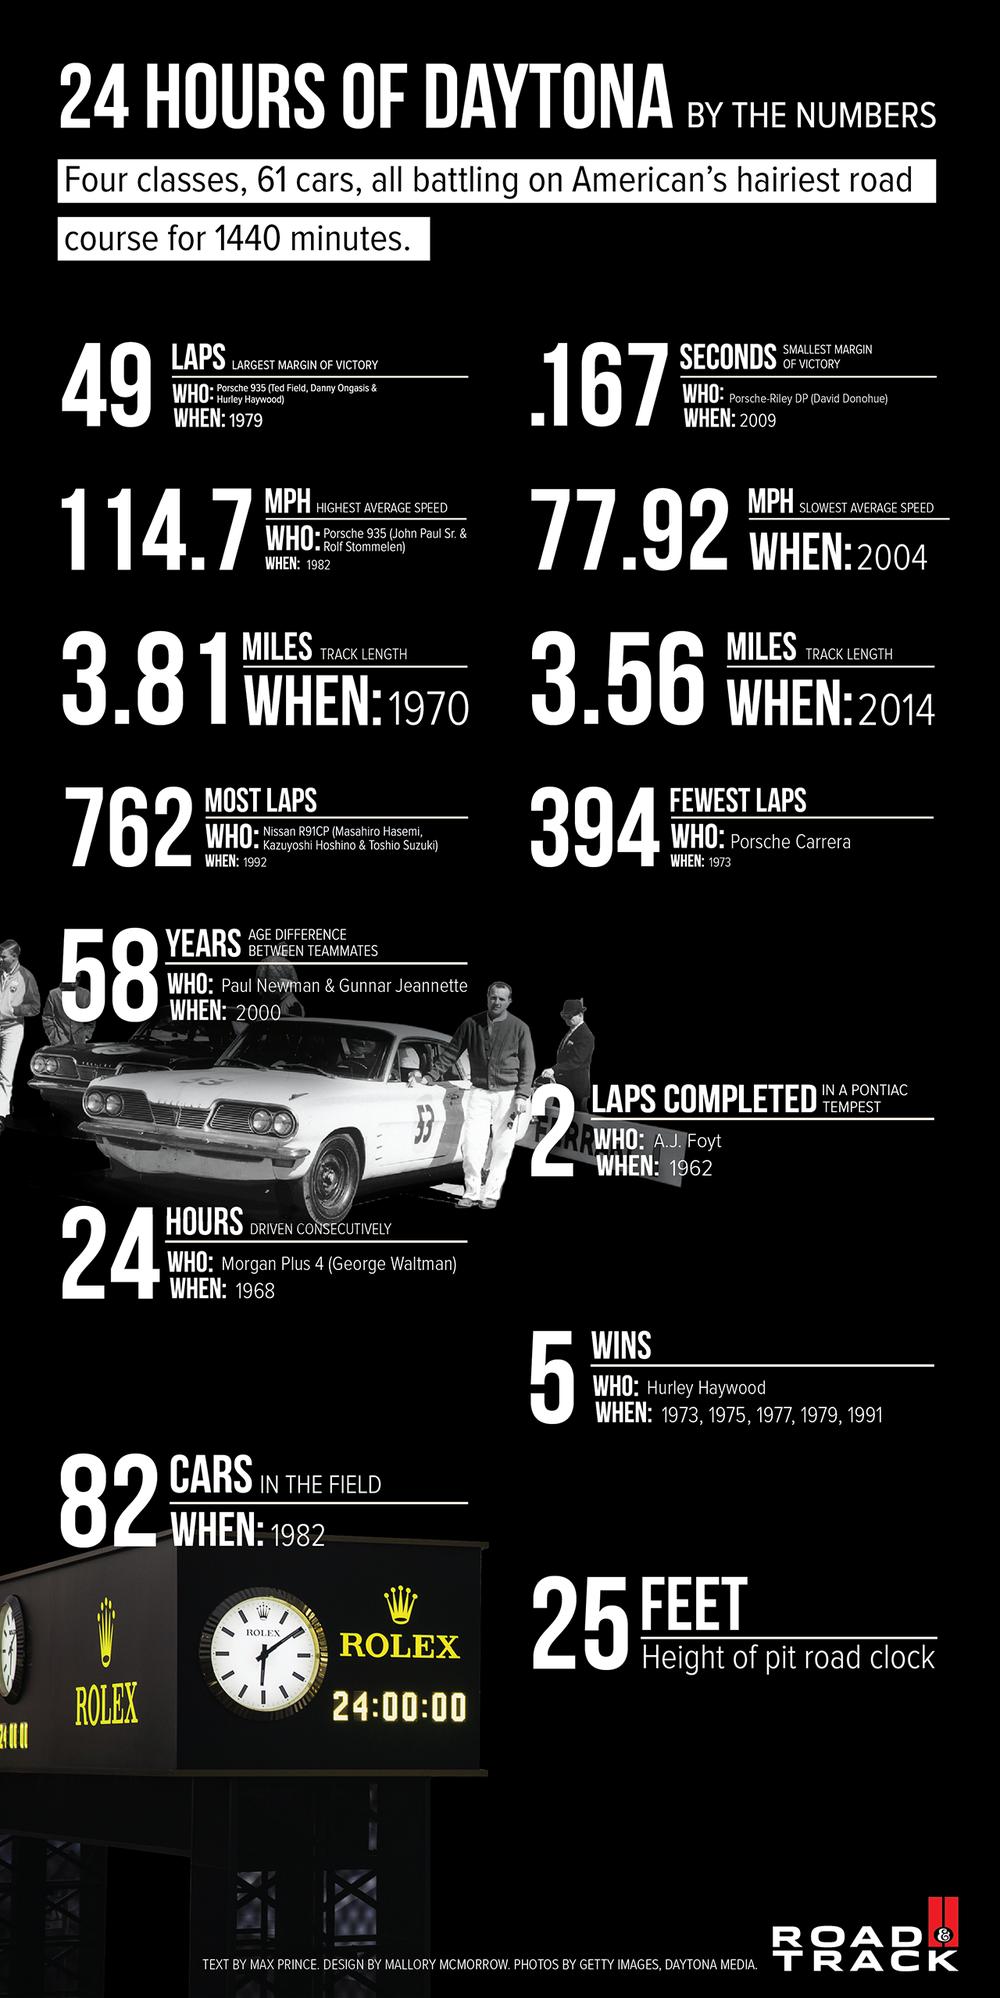 daytona_infographic.png